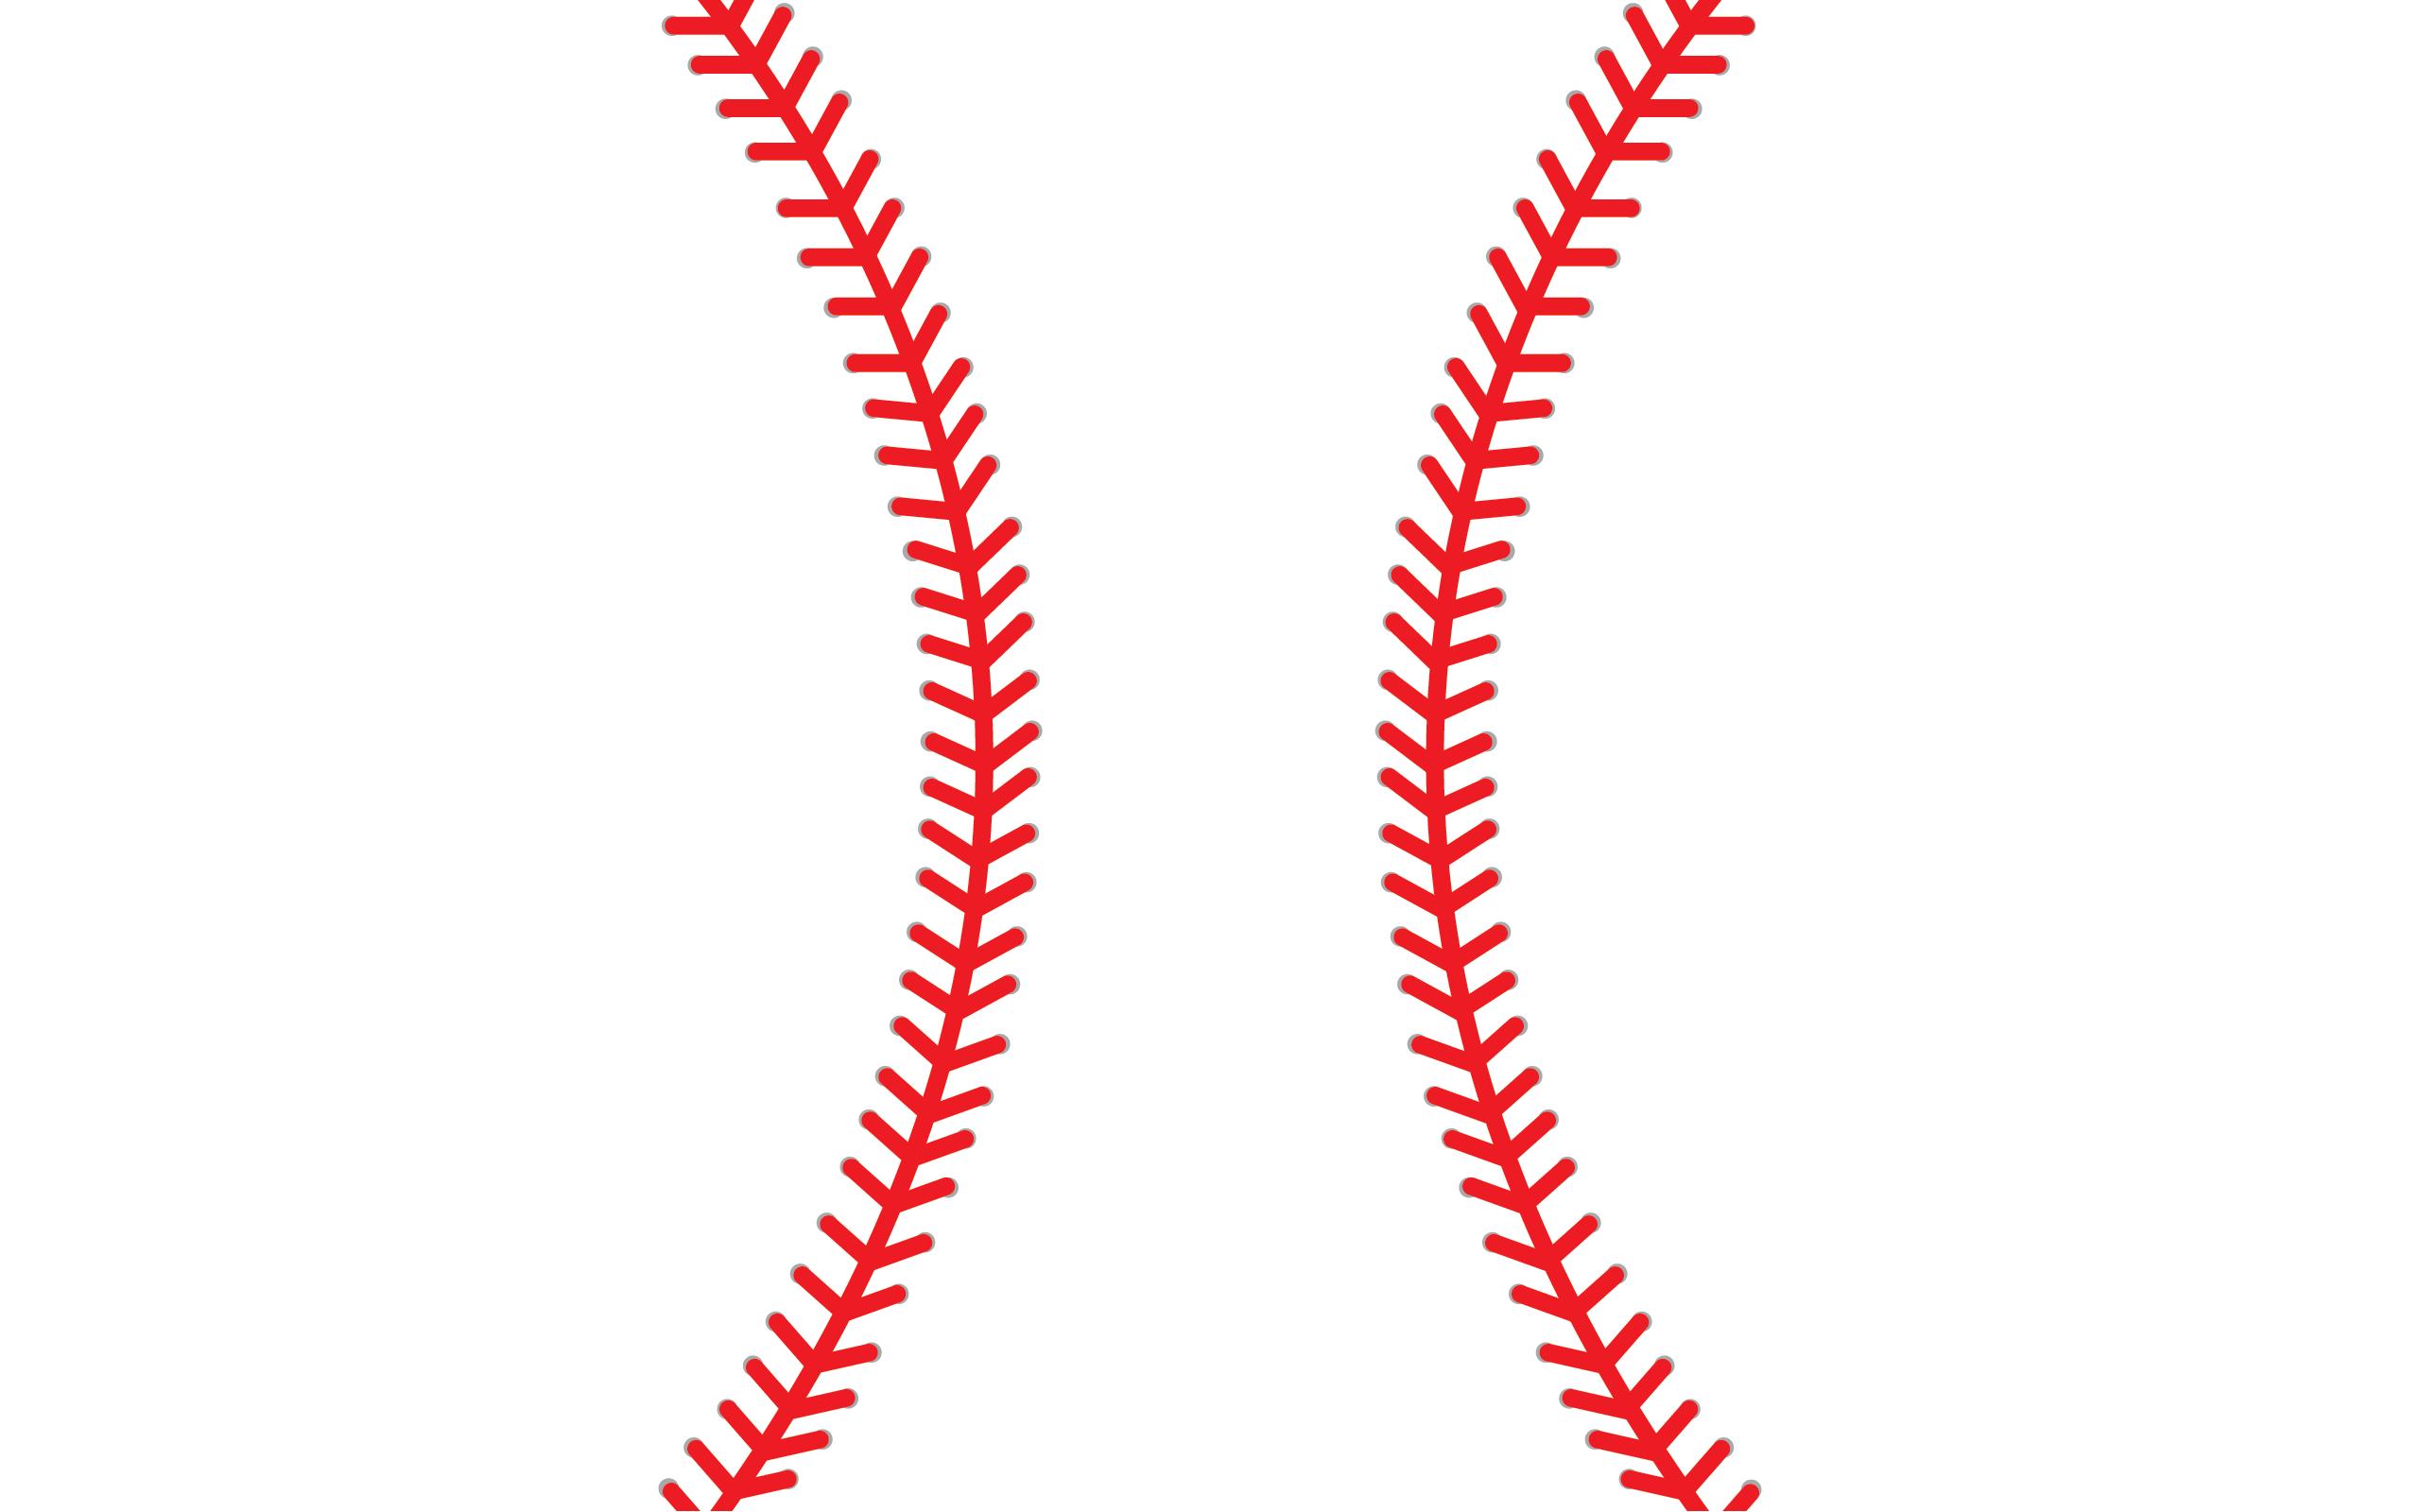 Baseball HD PNG - 93012